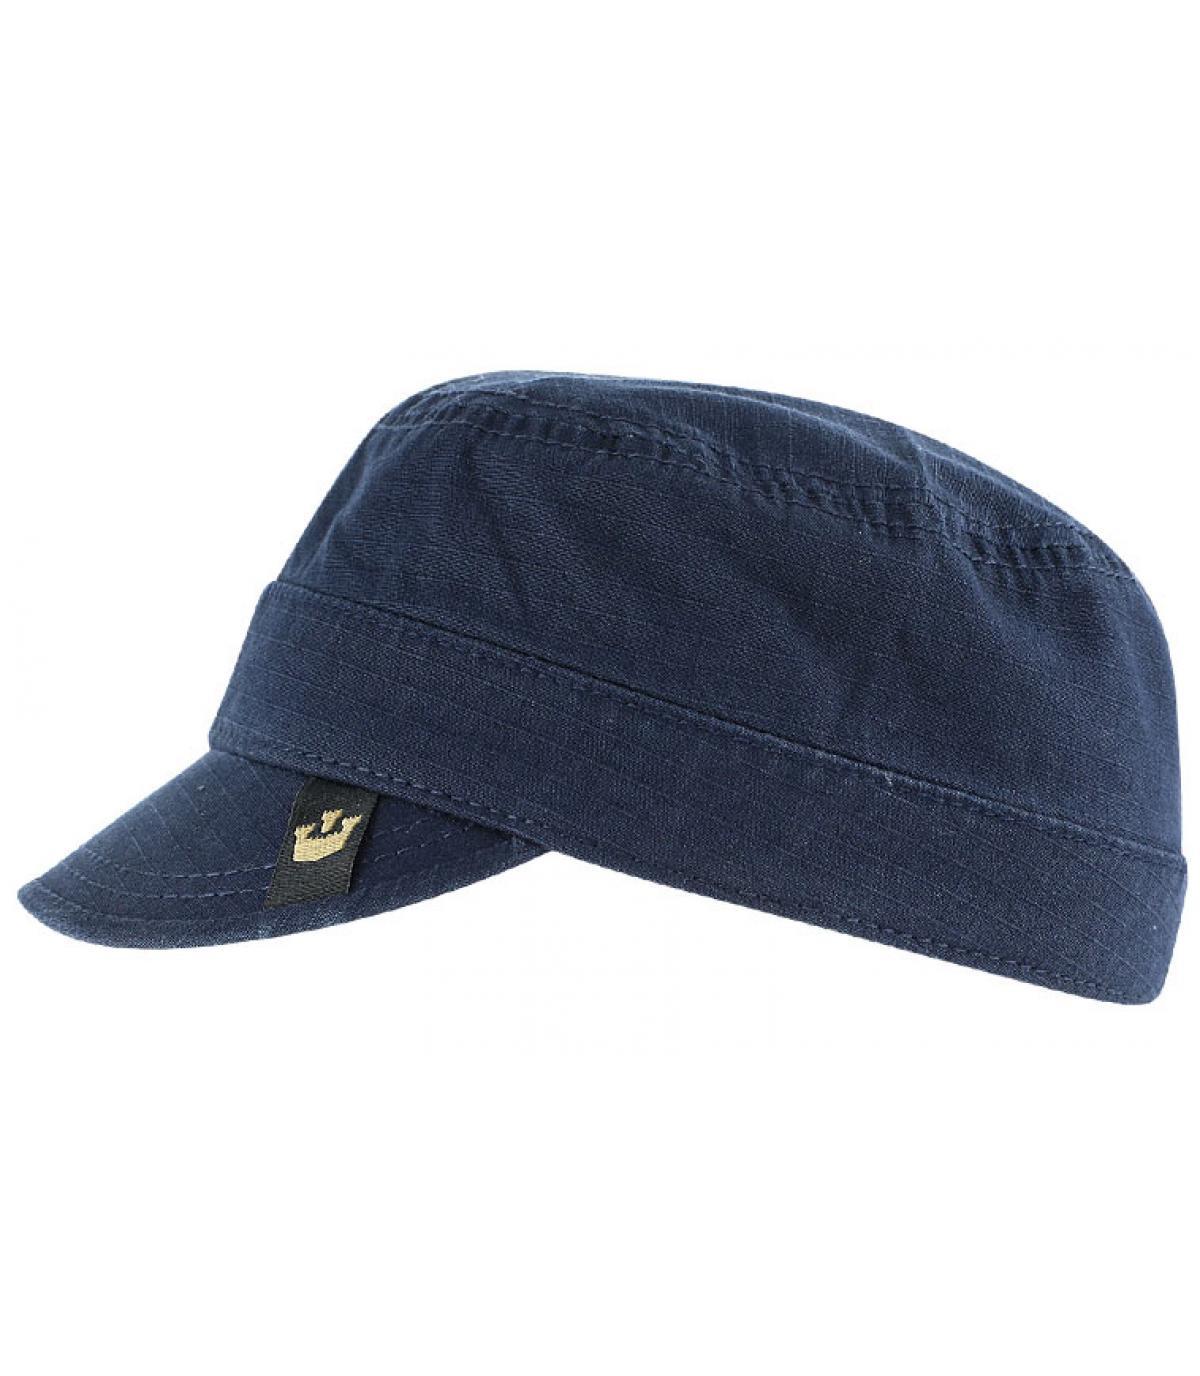 Goorin navy army cap